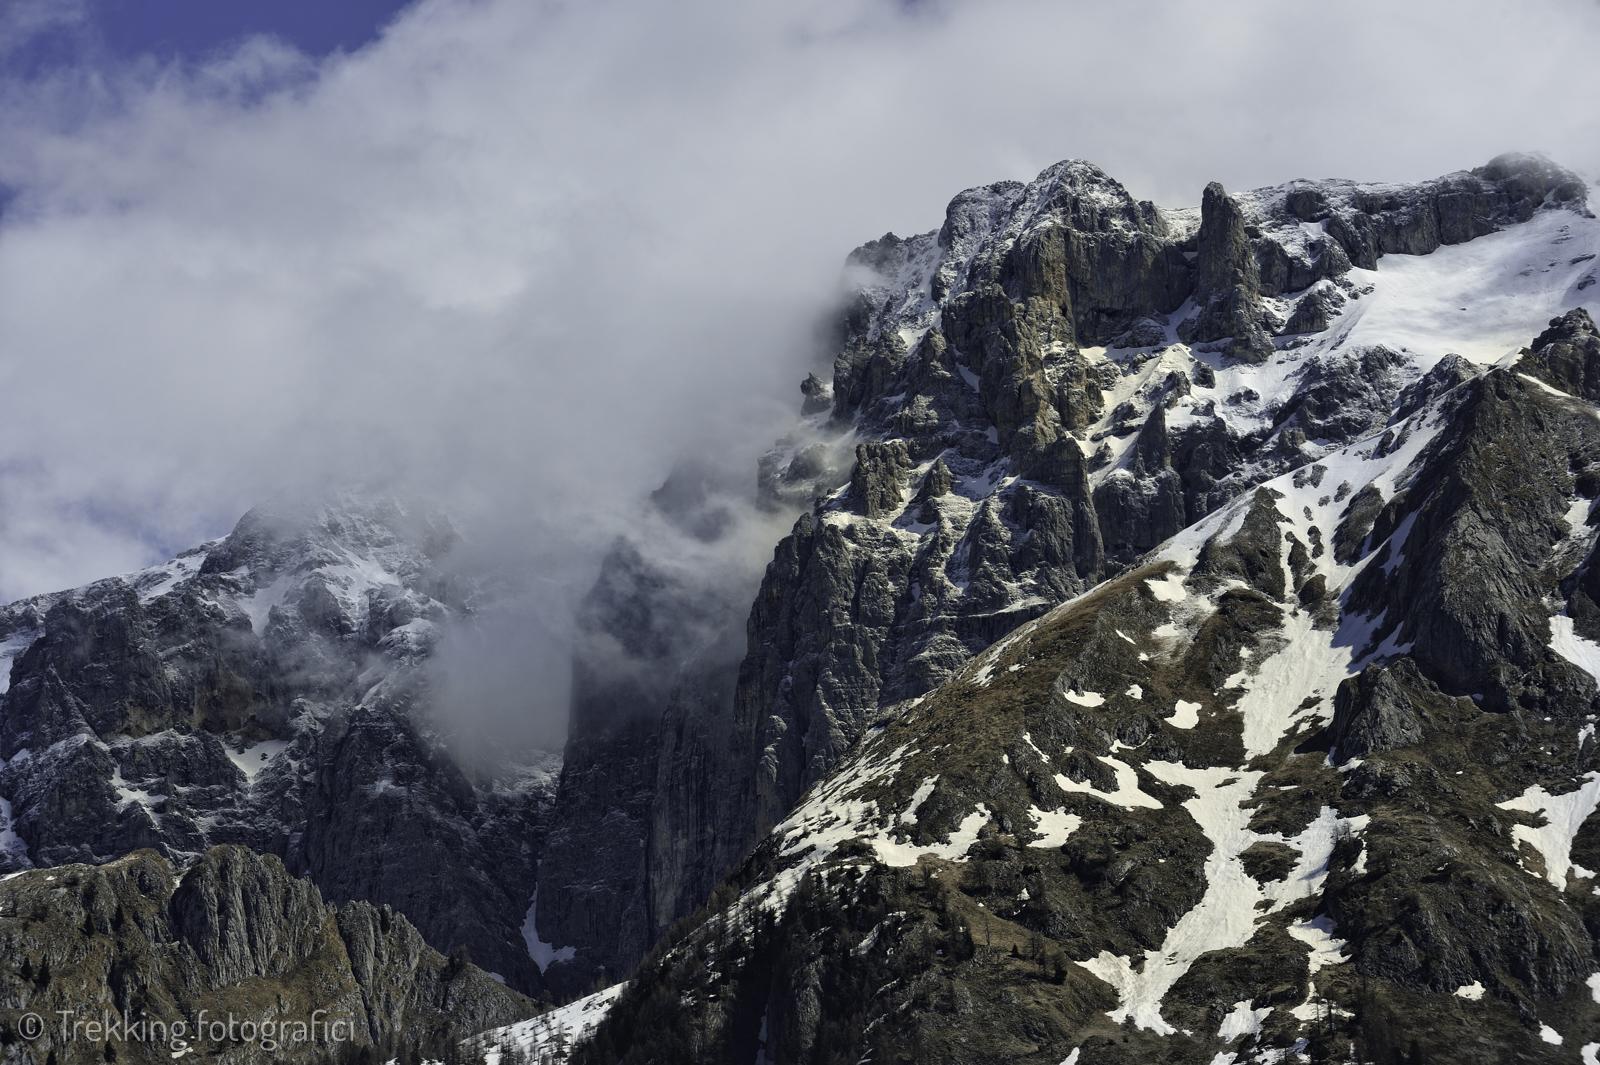 mirko-sotgiu-trekking-fotografici-best-of-dolomites